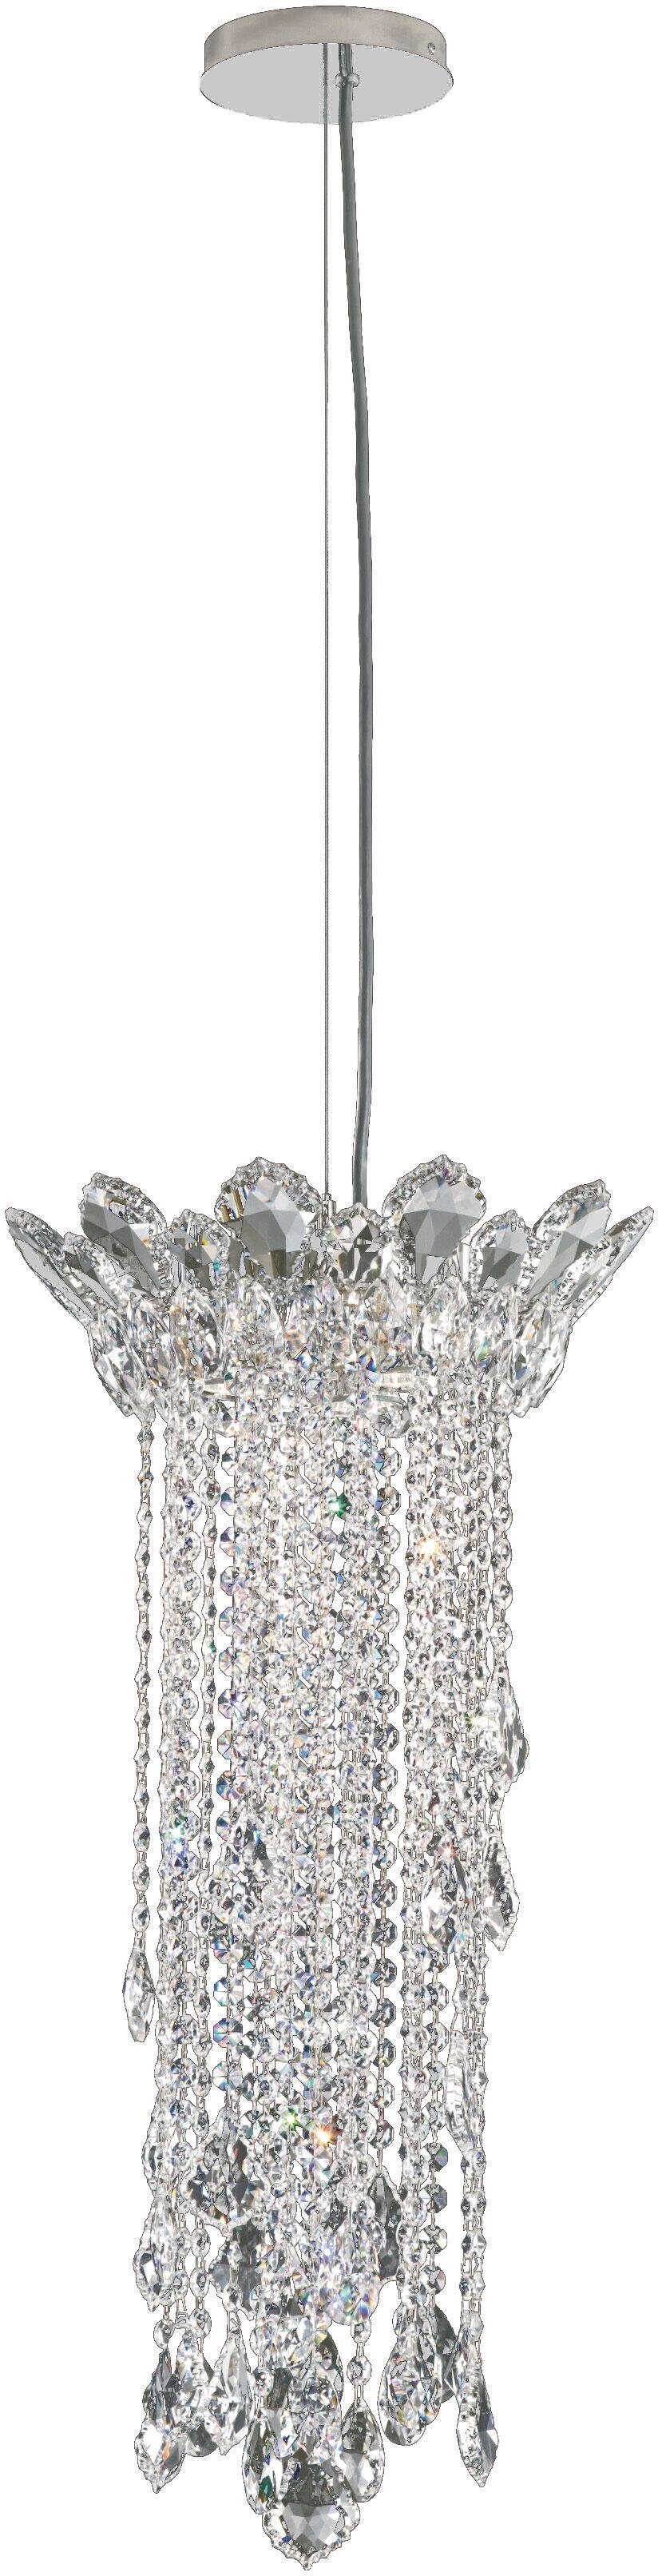 Trilliane 3-Light Crystal Chandelier Crystal Grade: Spectra